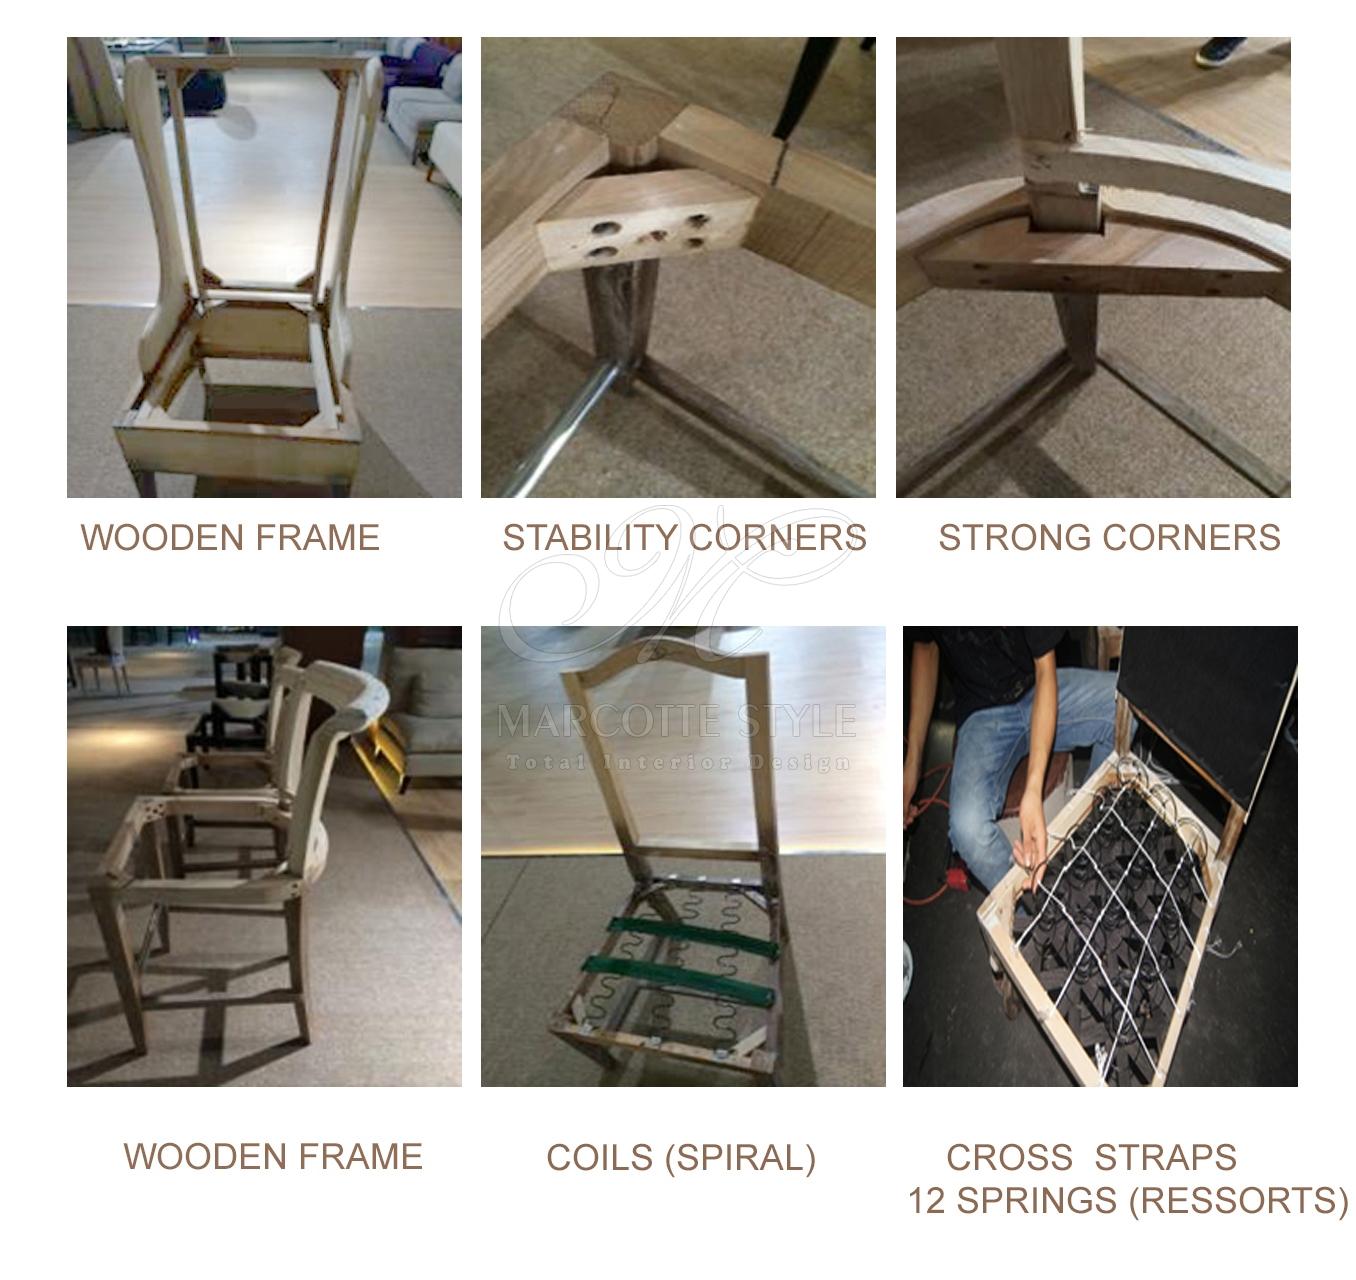 klassieke stoel Chronos - Marcottestyle